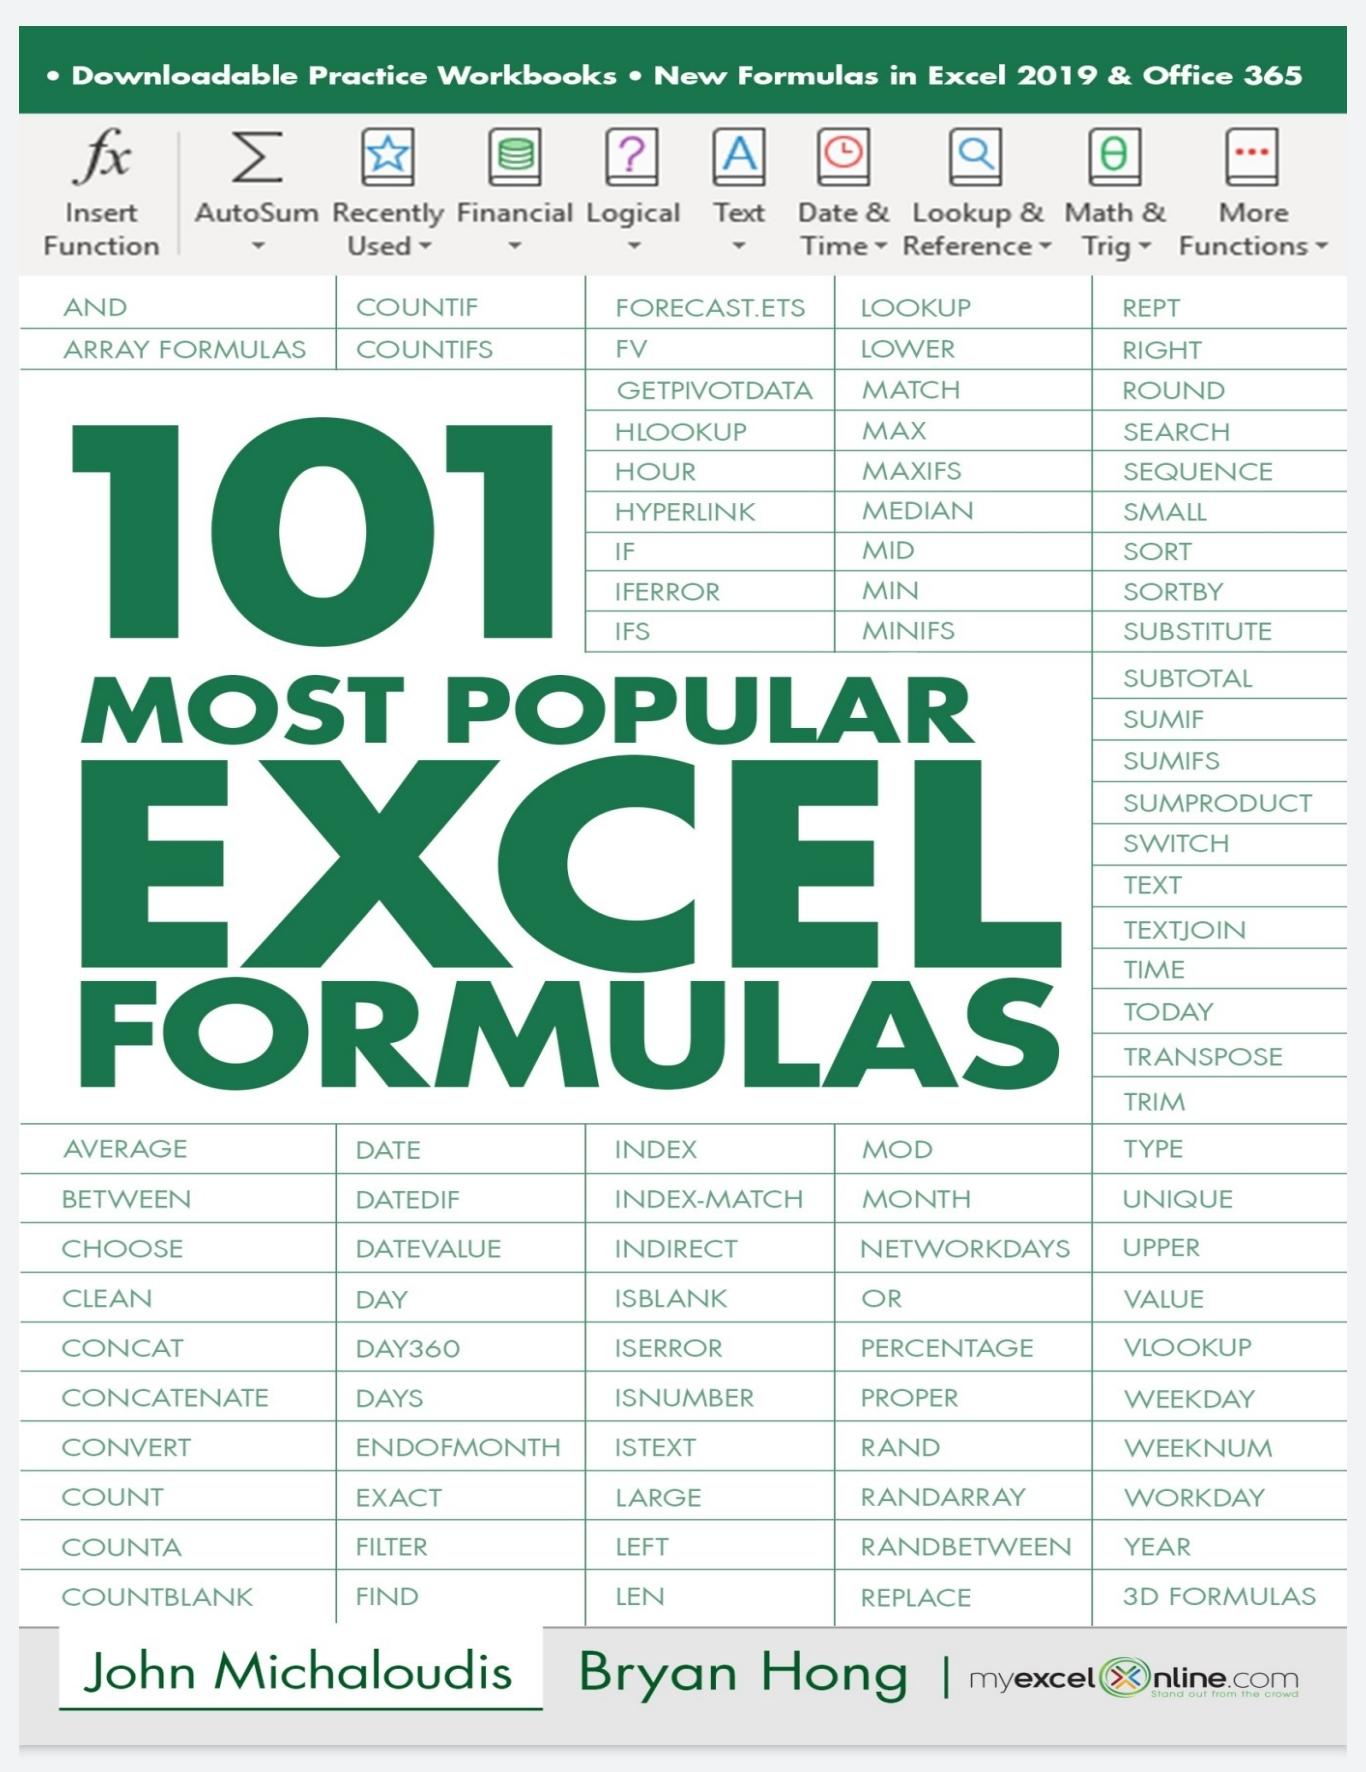 20 Most Popular Excel Formulas 20 PDF Free   KING OF EXCEL